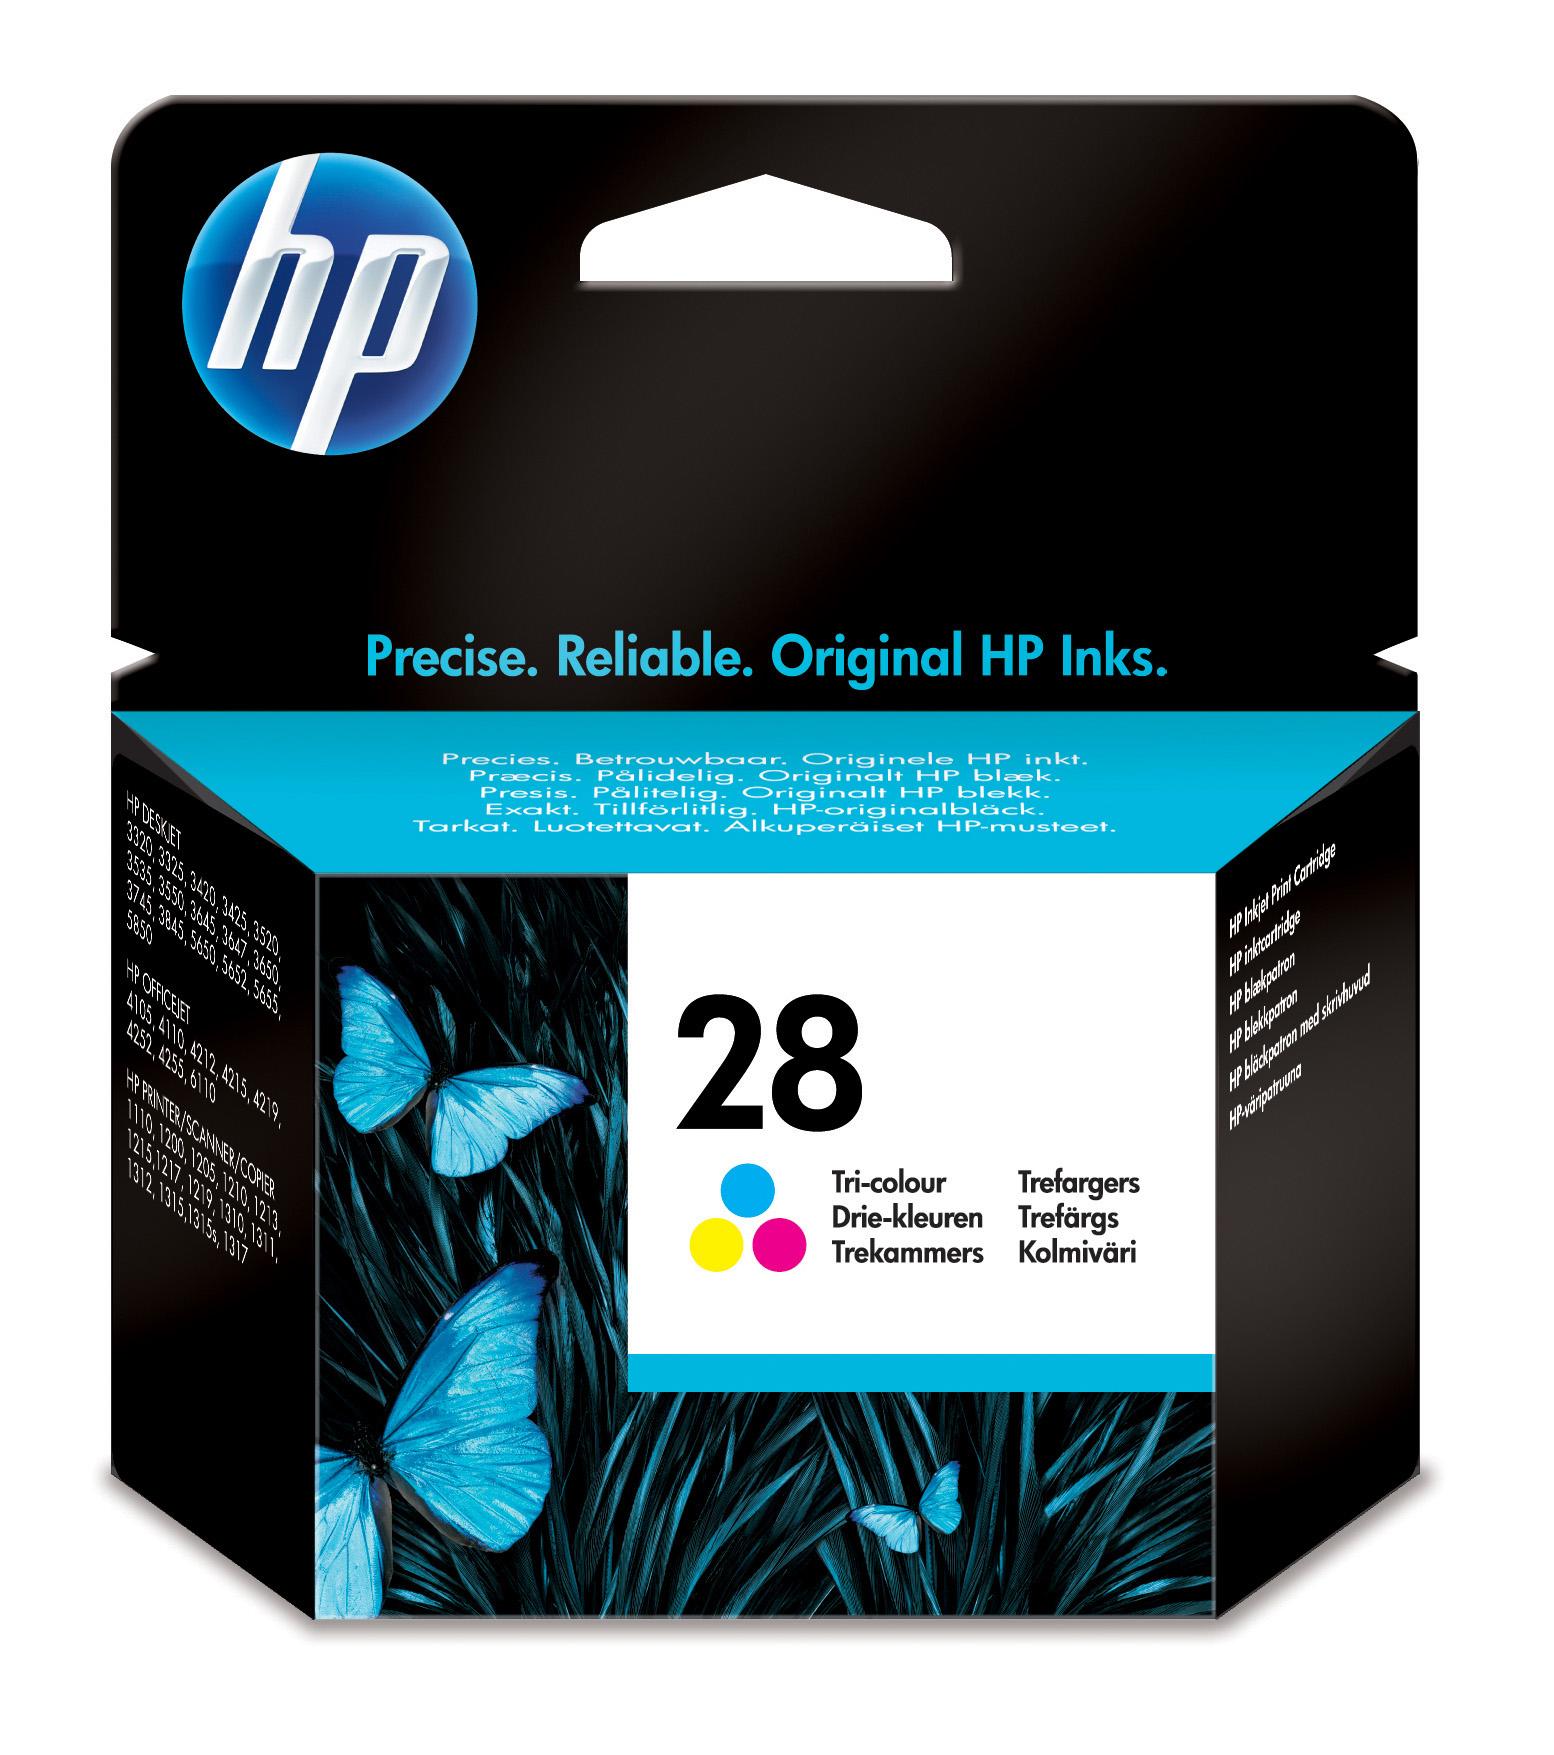 Cartucho inkjet HP 28 (C8728AE) 3 col